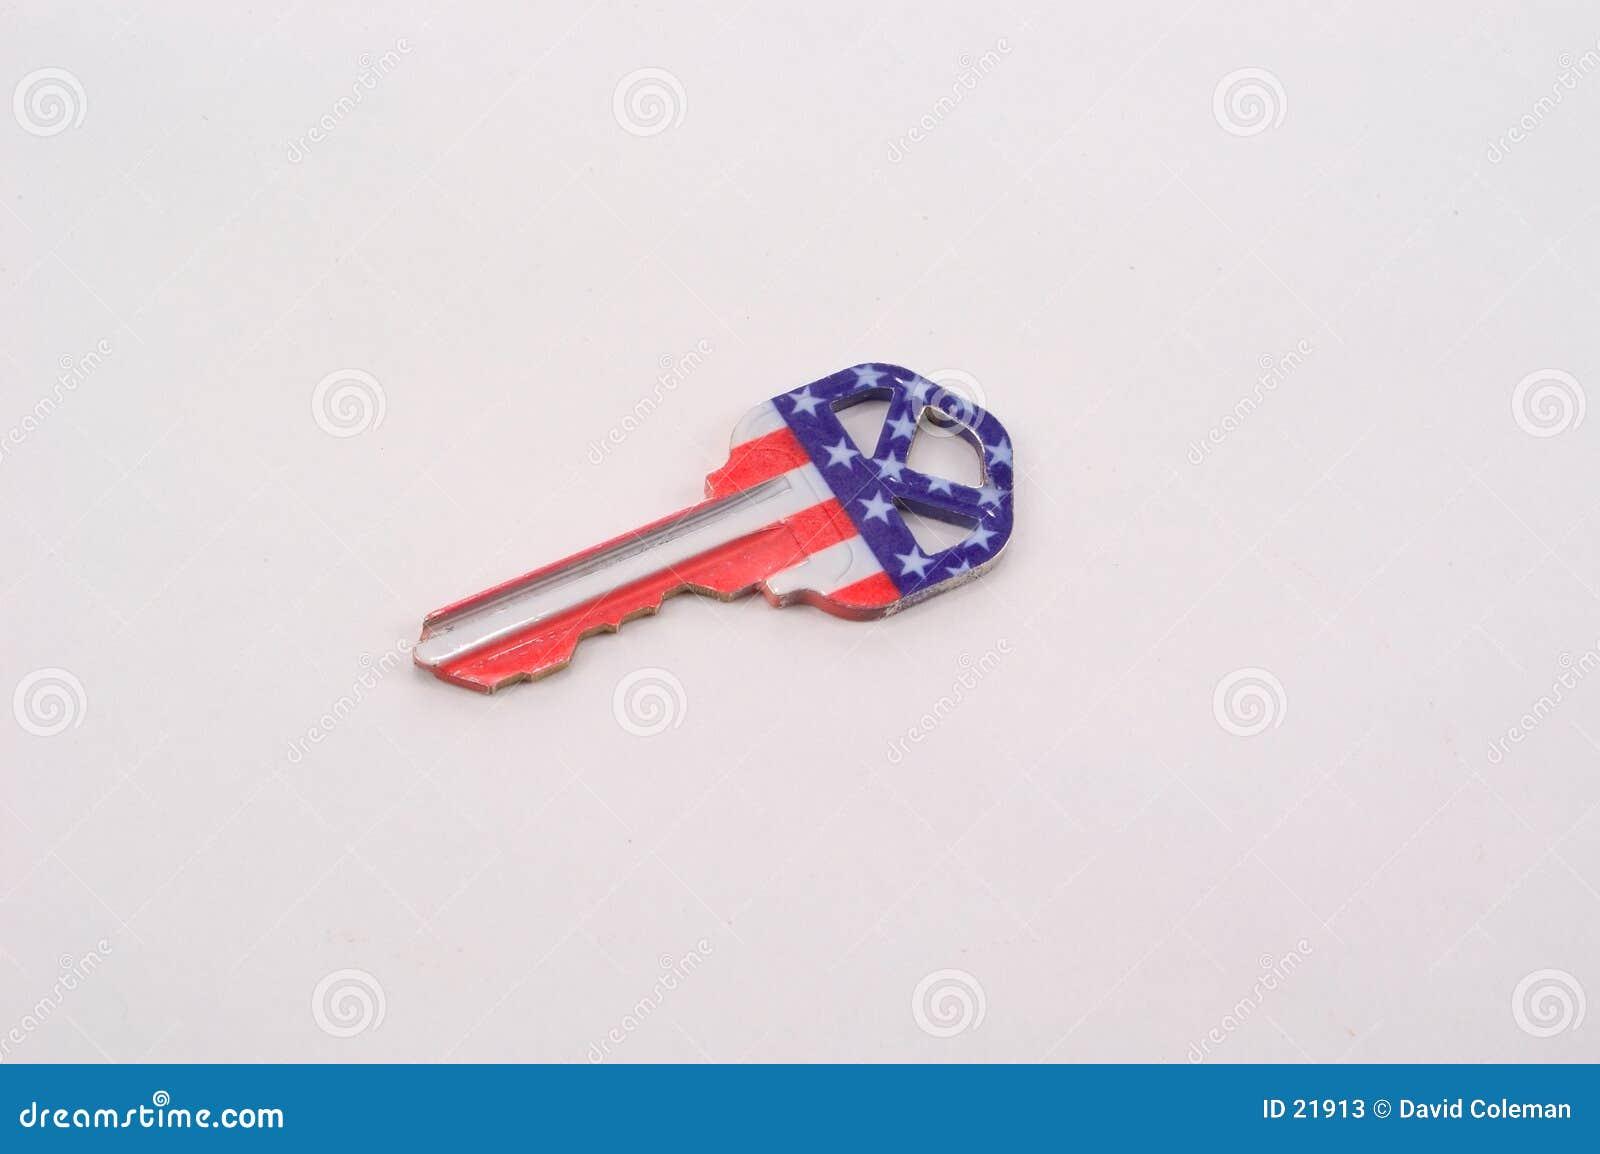 Patriotic Key